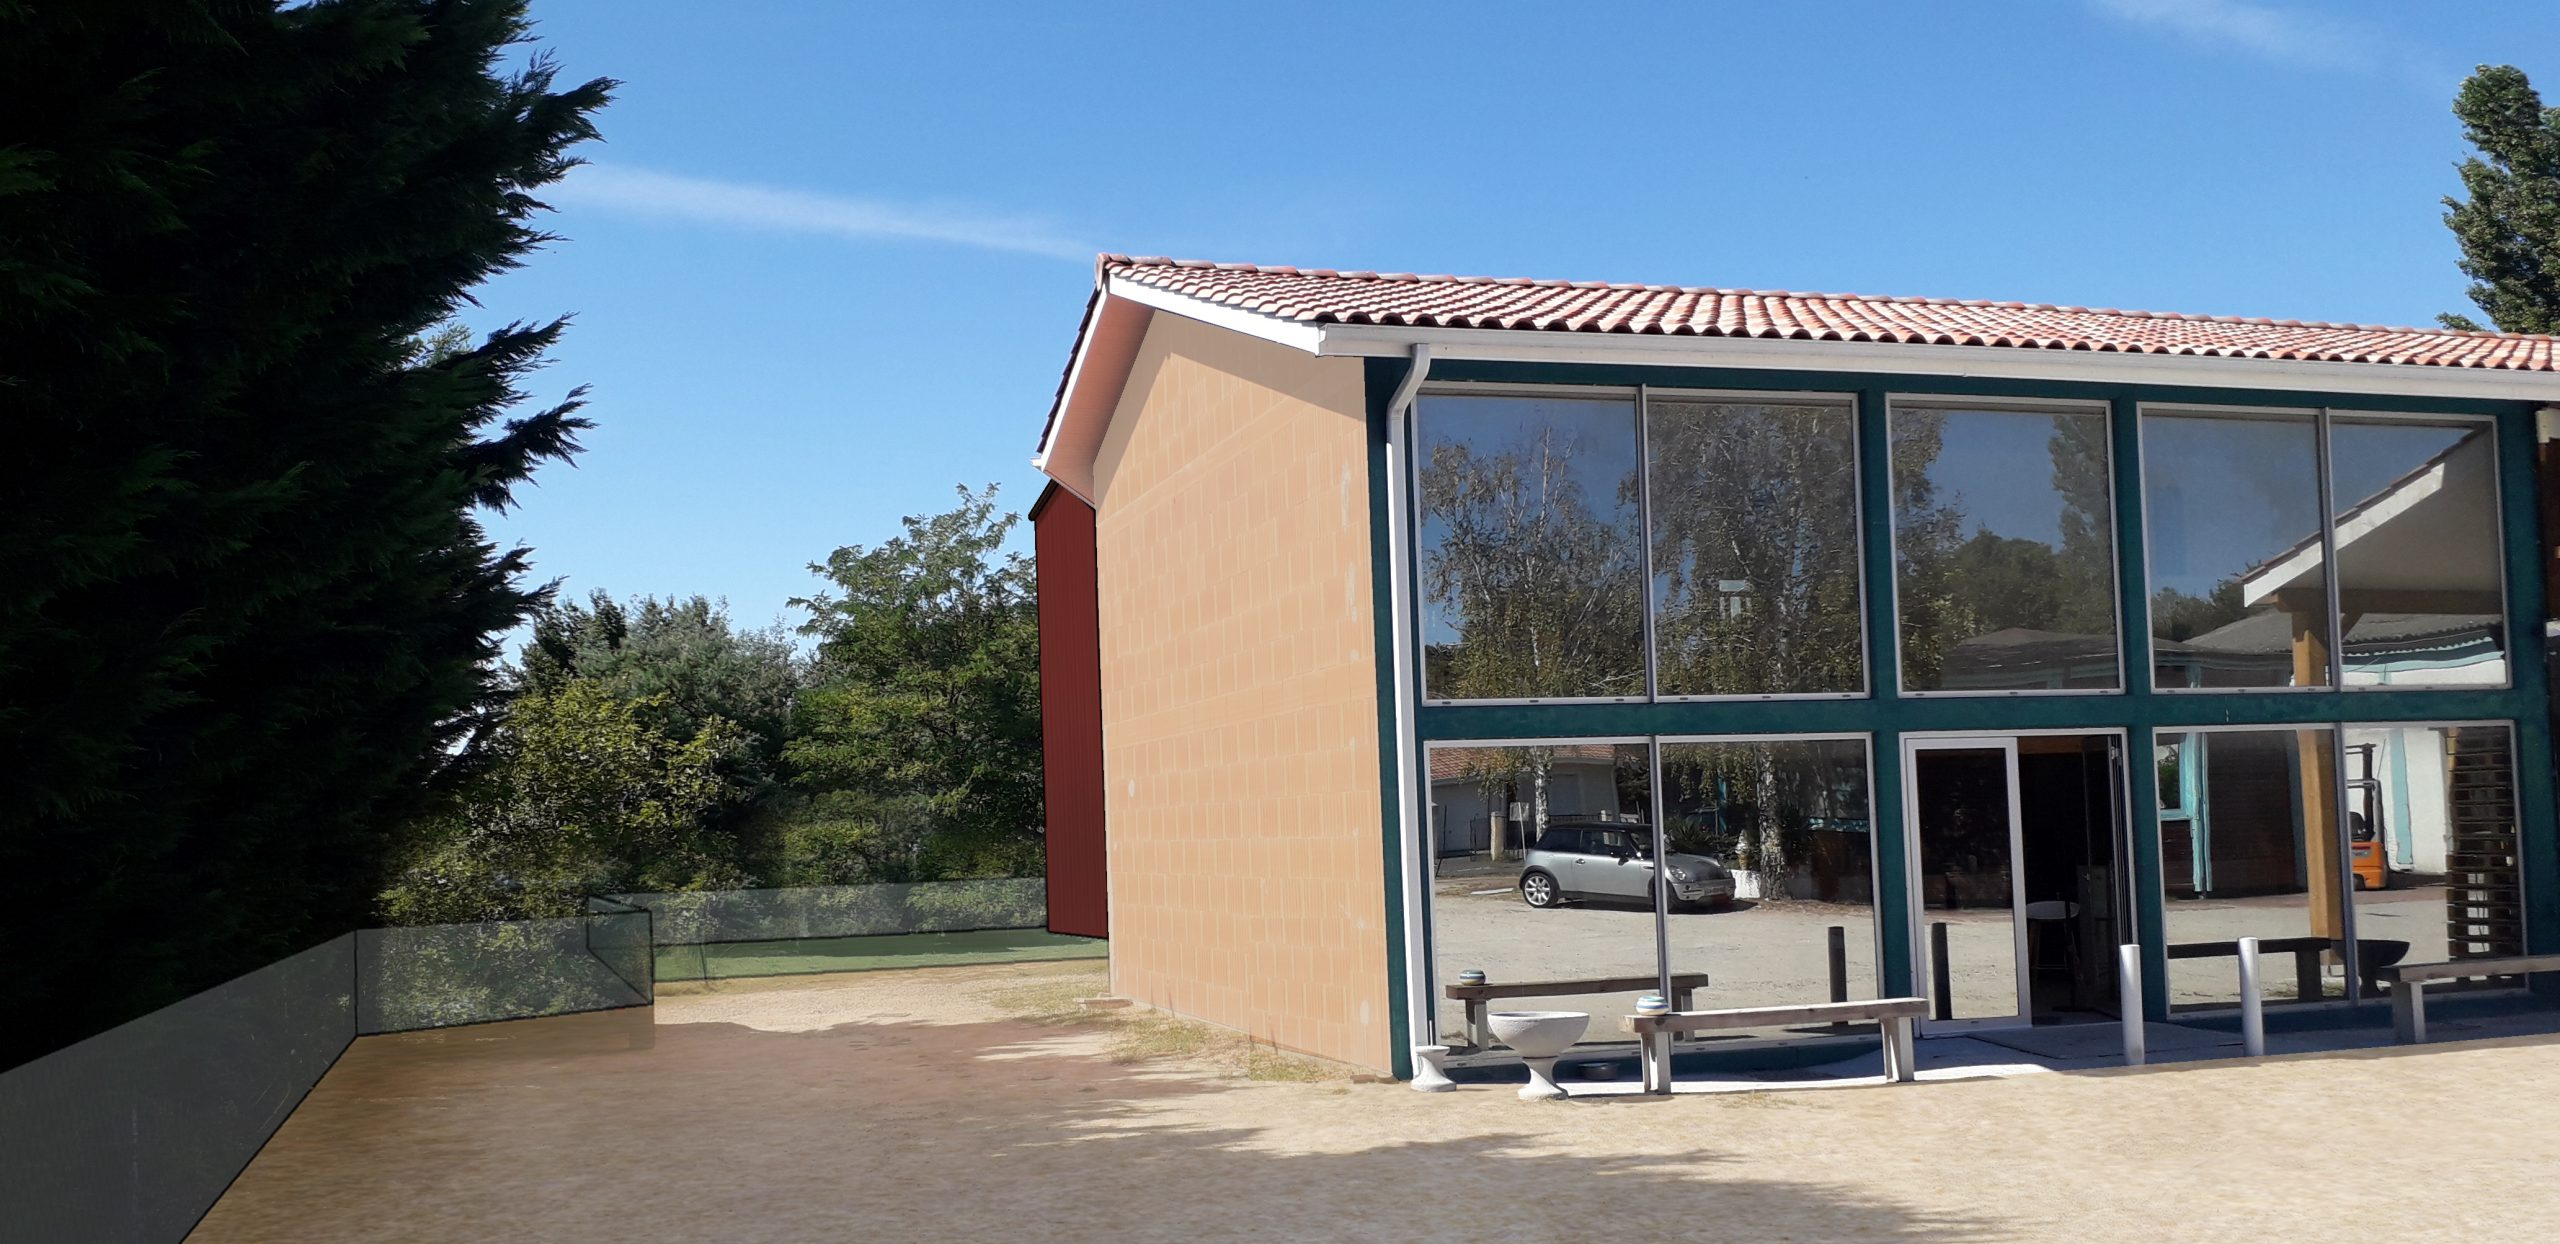 Batiment Stockage Olympe Architecte Salles